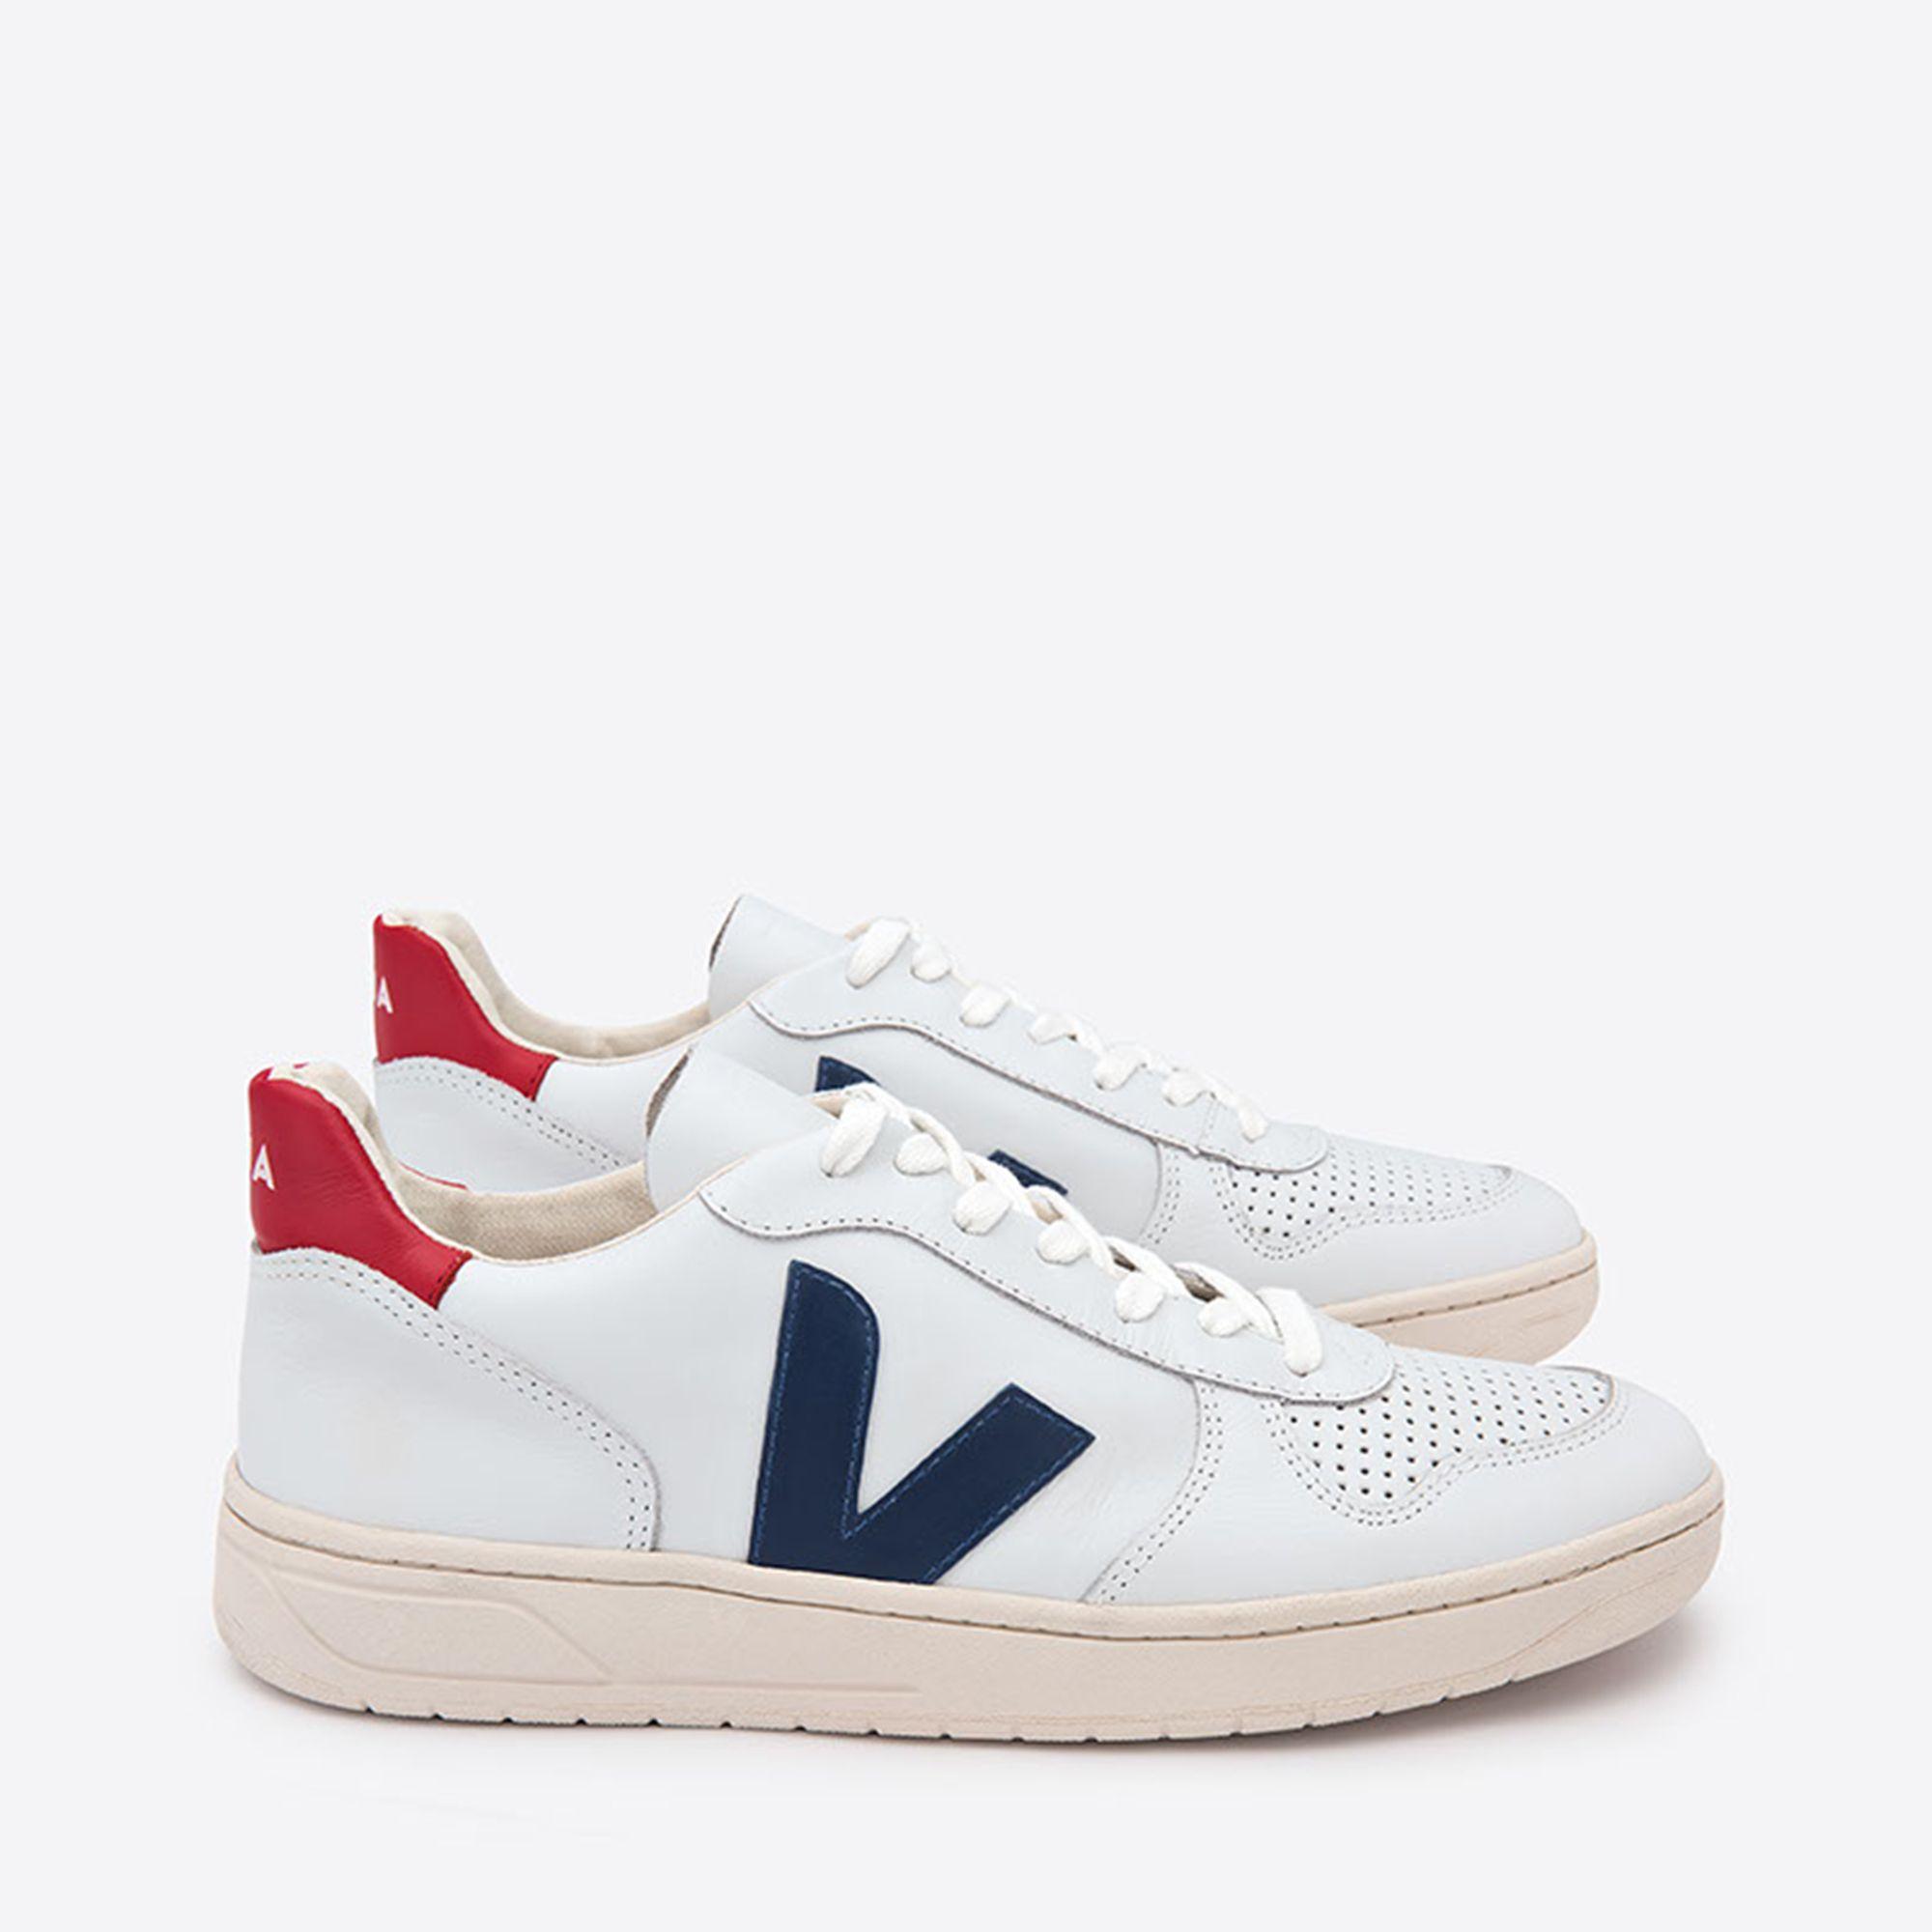 176ad4a2a64 Veja V-10 sneakers i skinn, Vit, 41